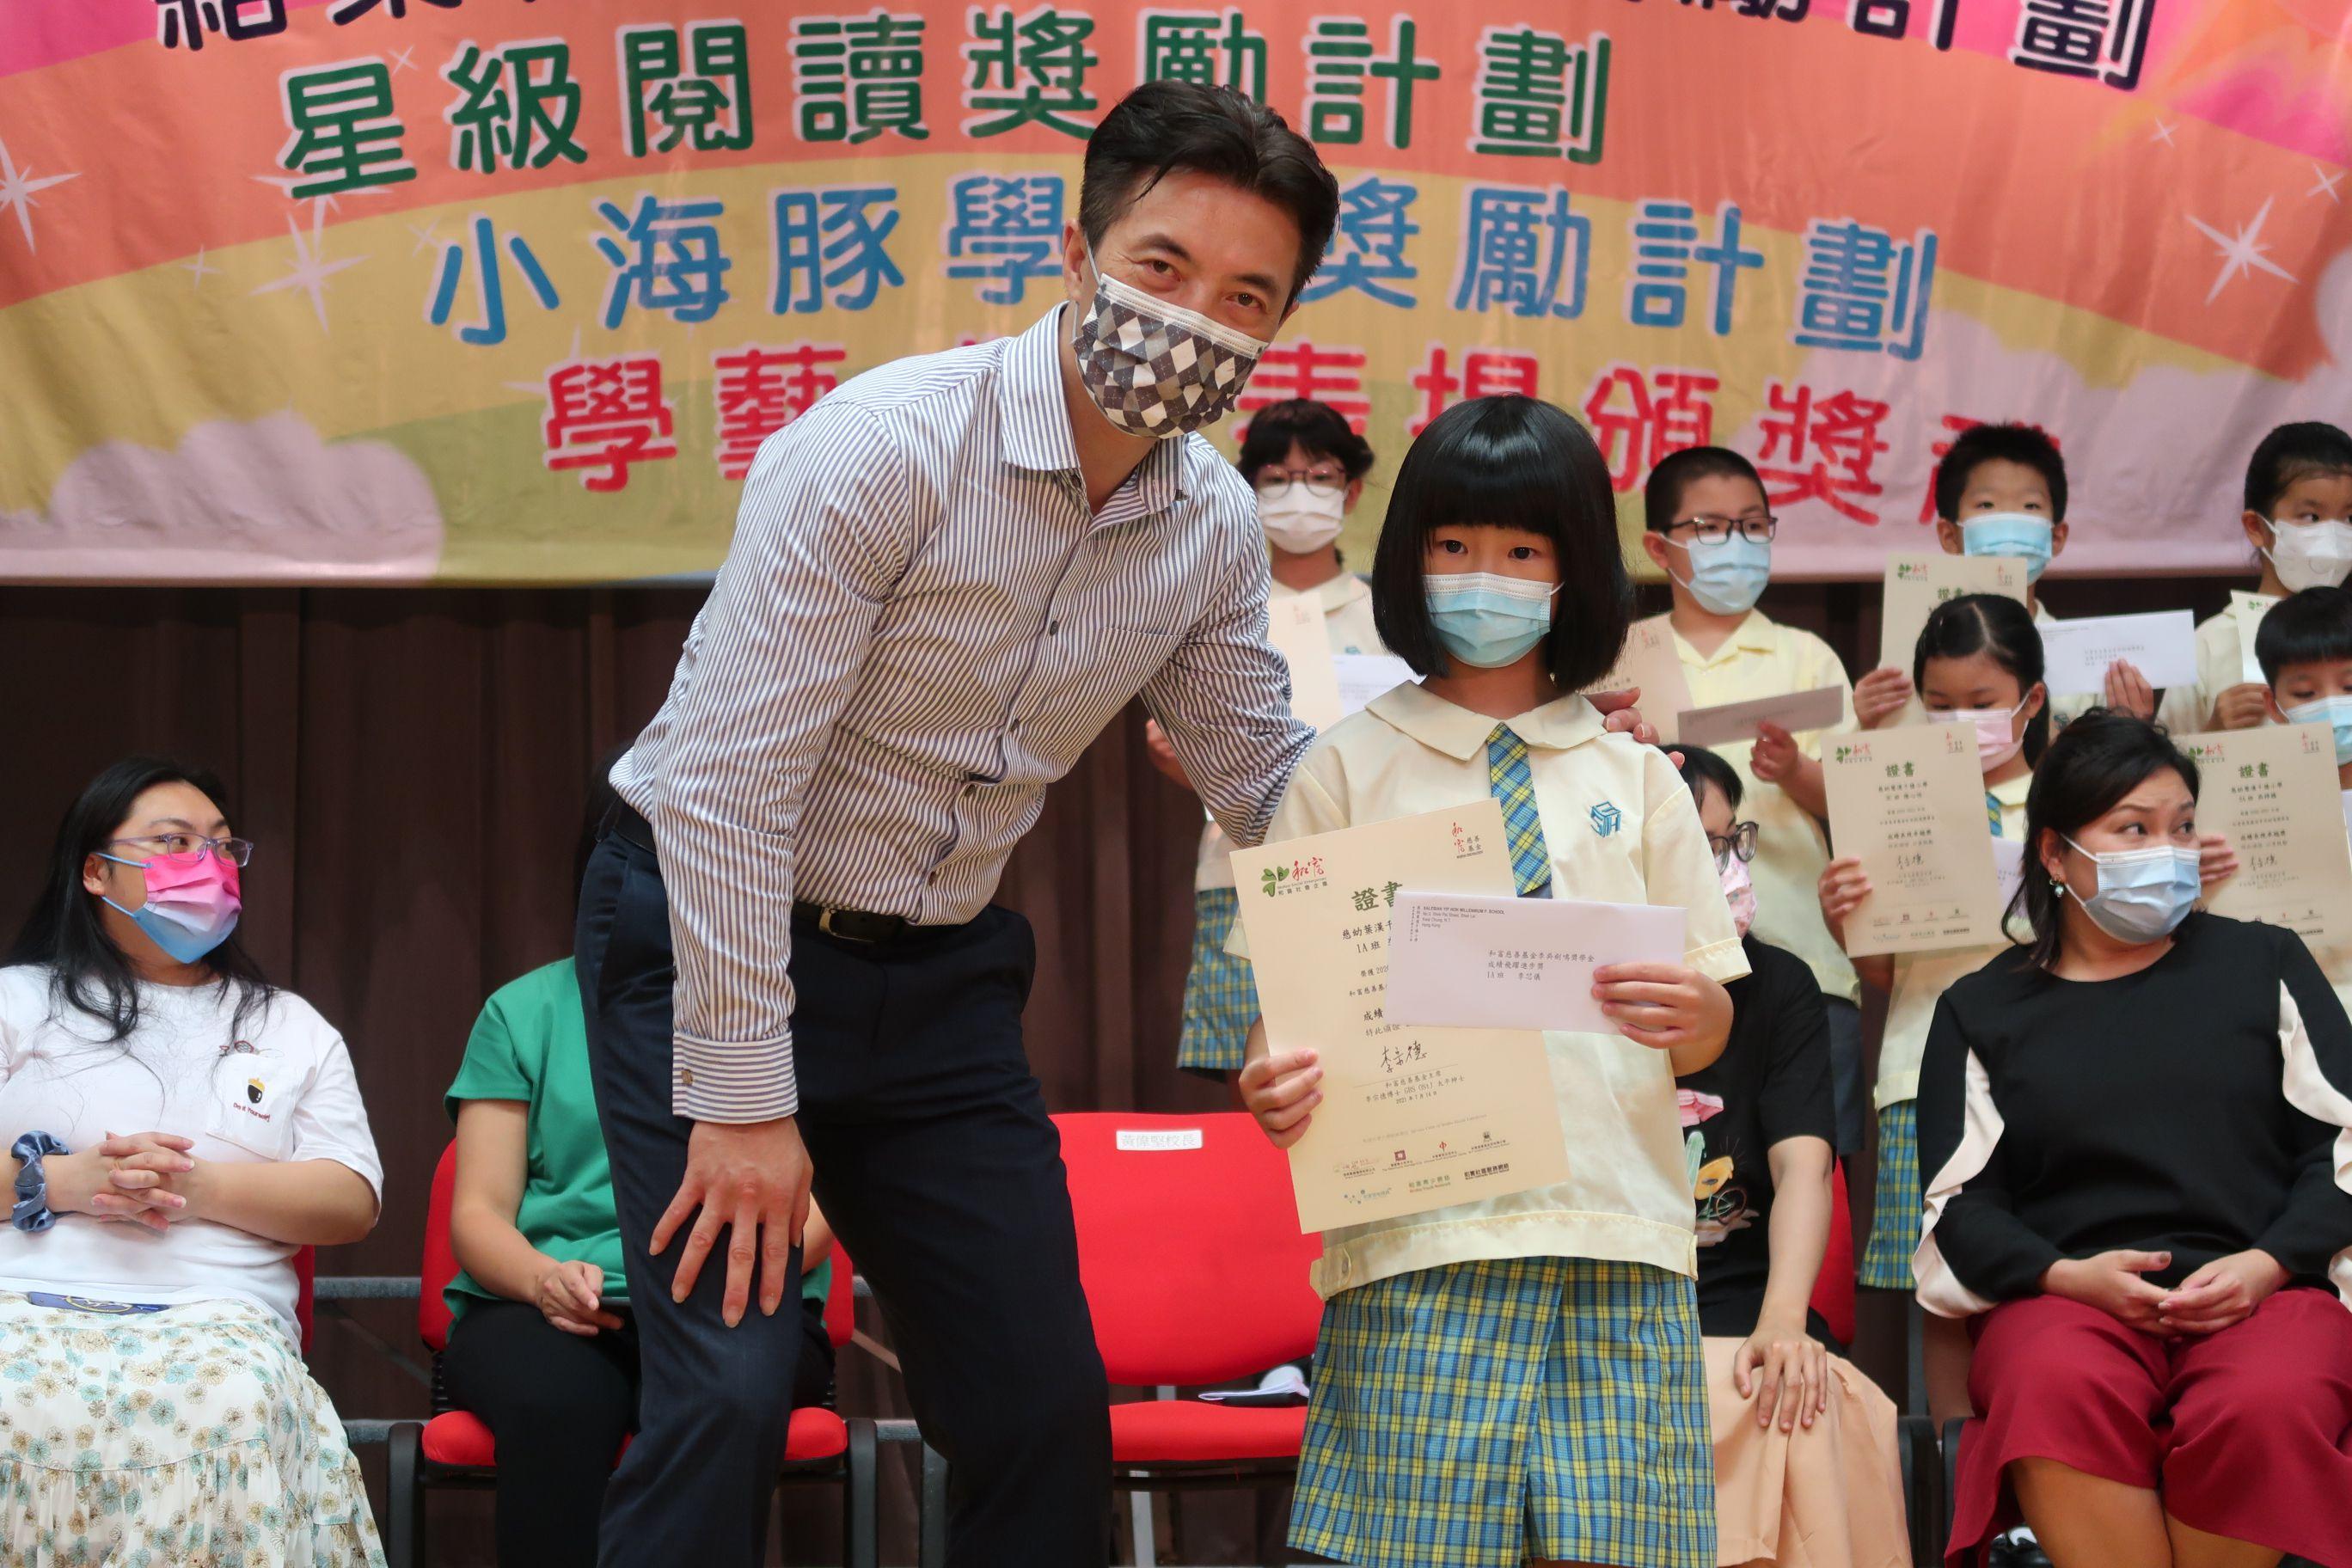 https://syh.edu.hk/sites/default/files/img_5936.jpg